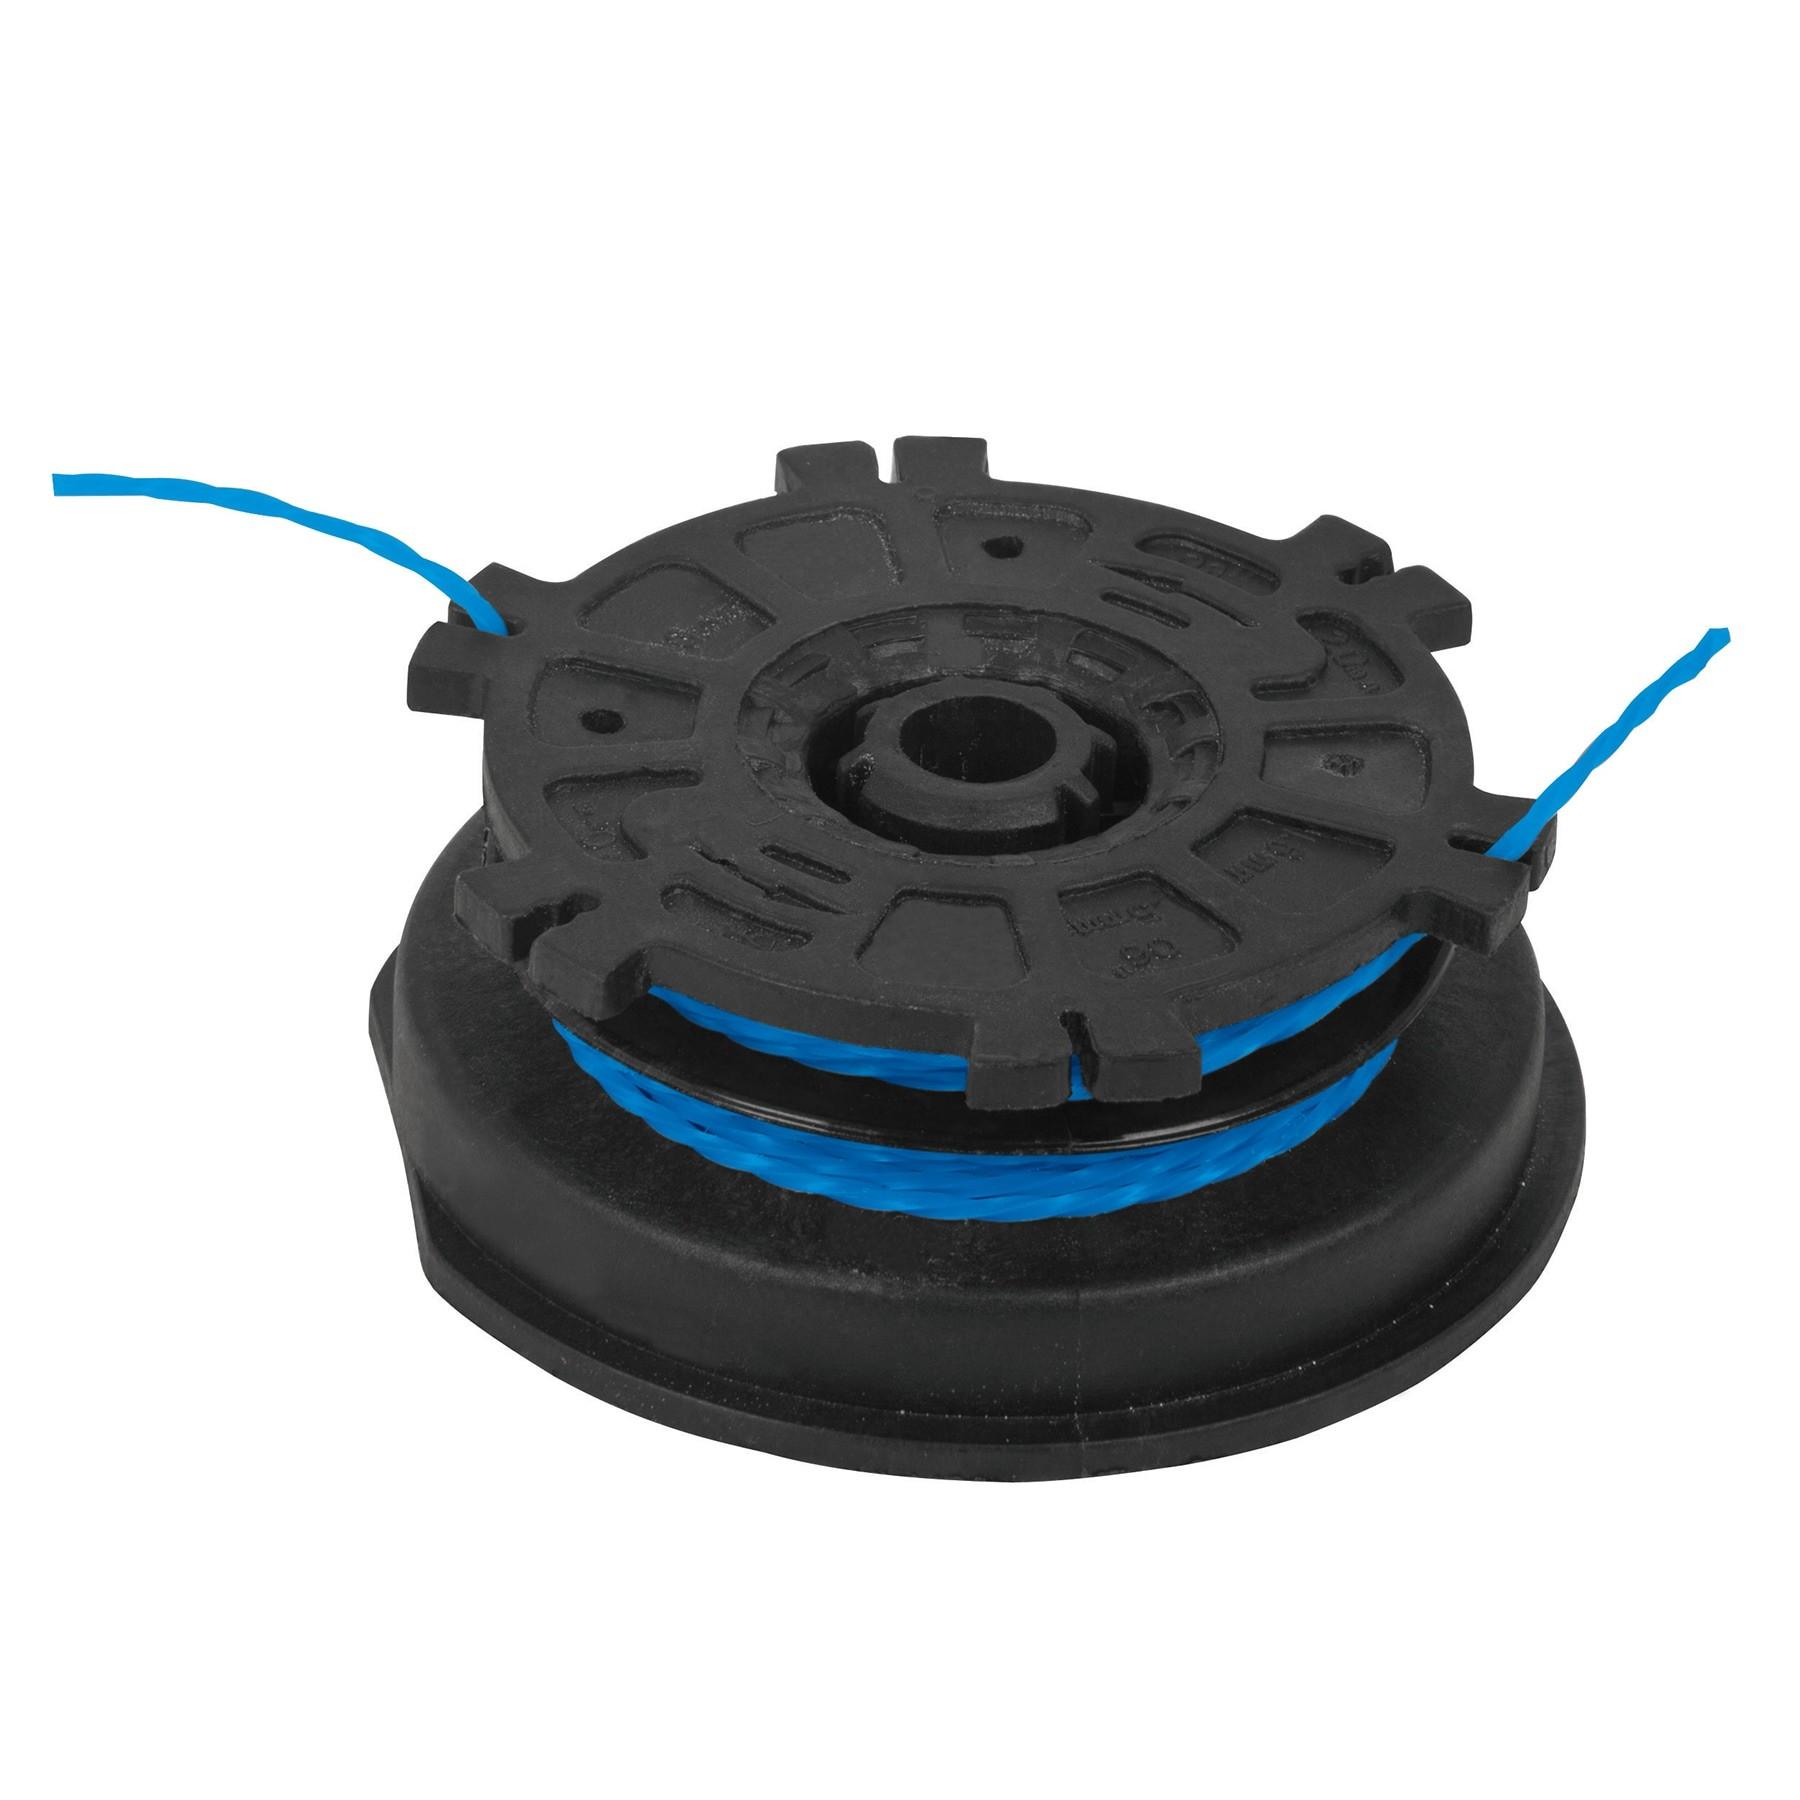 Repuesto de carrete de hilo para desbrozadoras DES-600